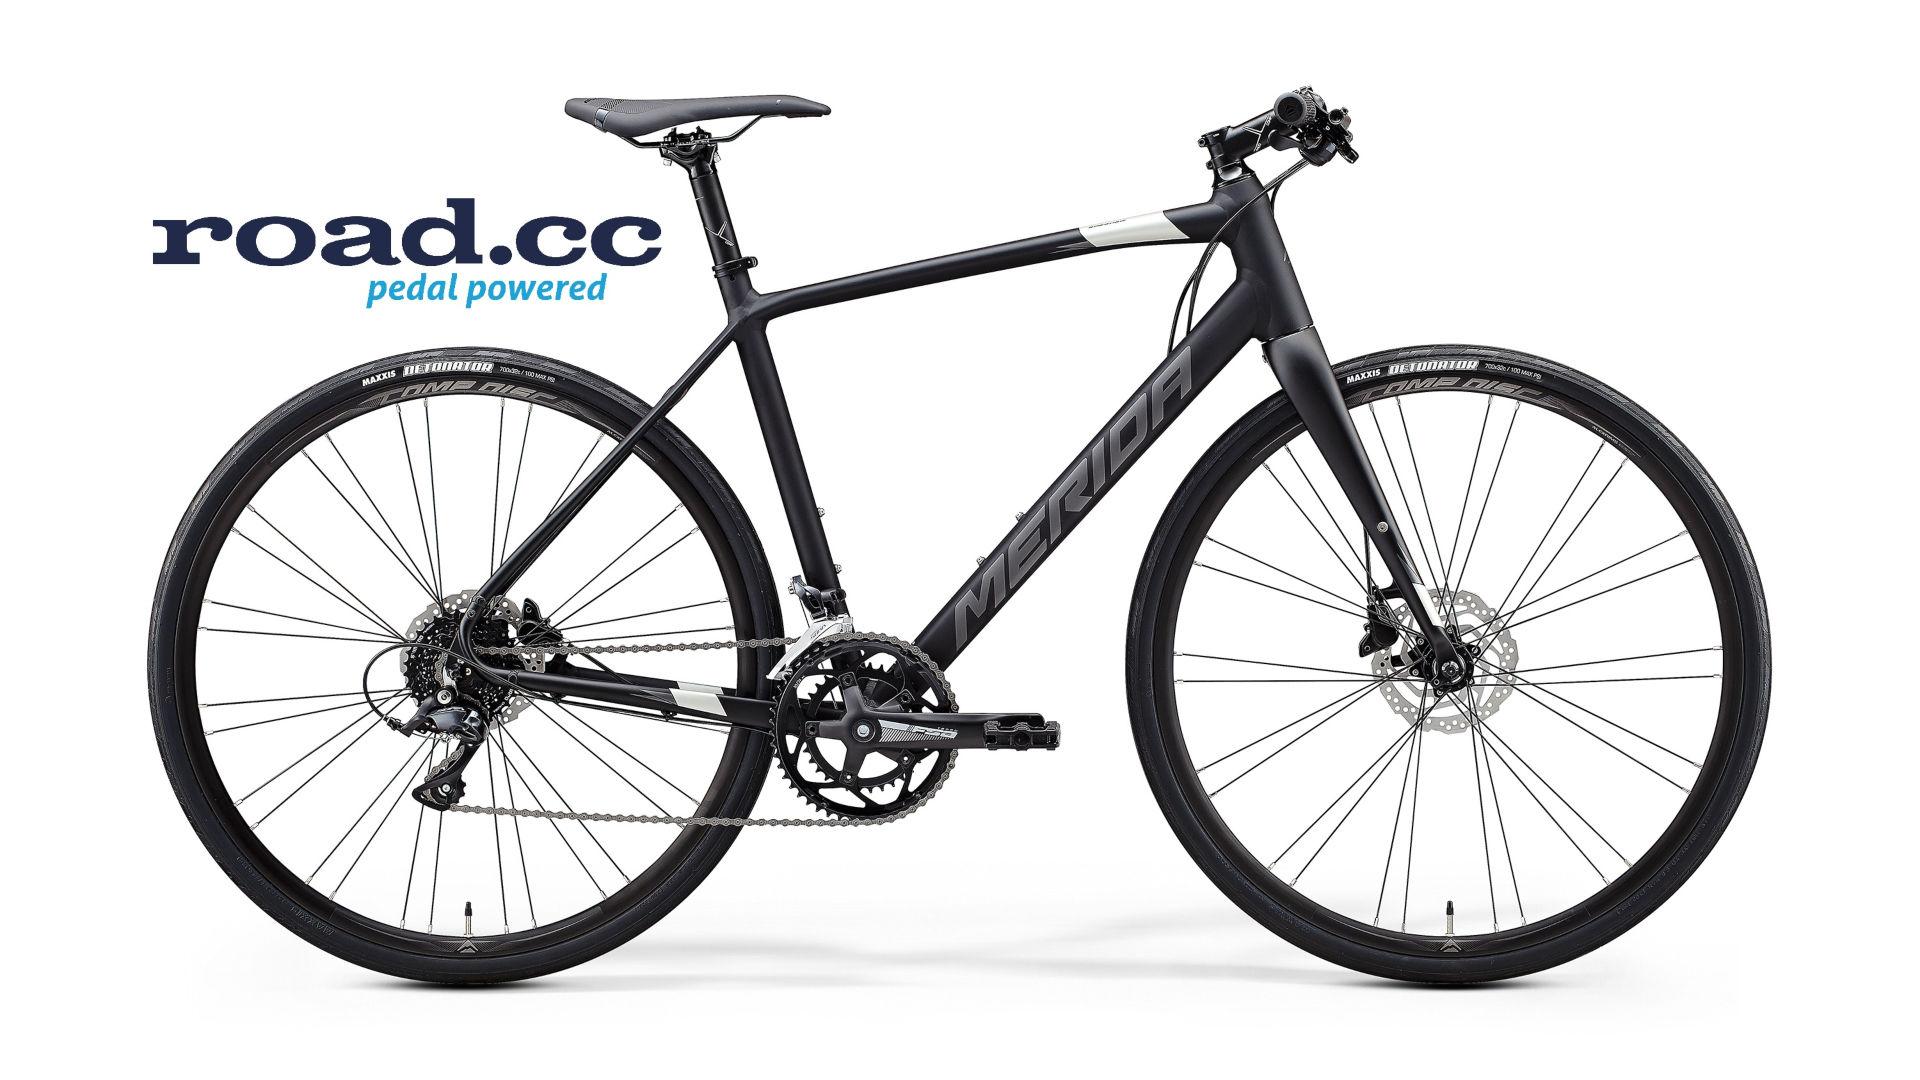 Merida Speeder, Speeder 200, rowery Merida, Merida bikes, Merida bike, rowery fitness, rower fitness, Merida Speeder 200